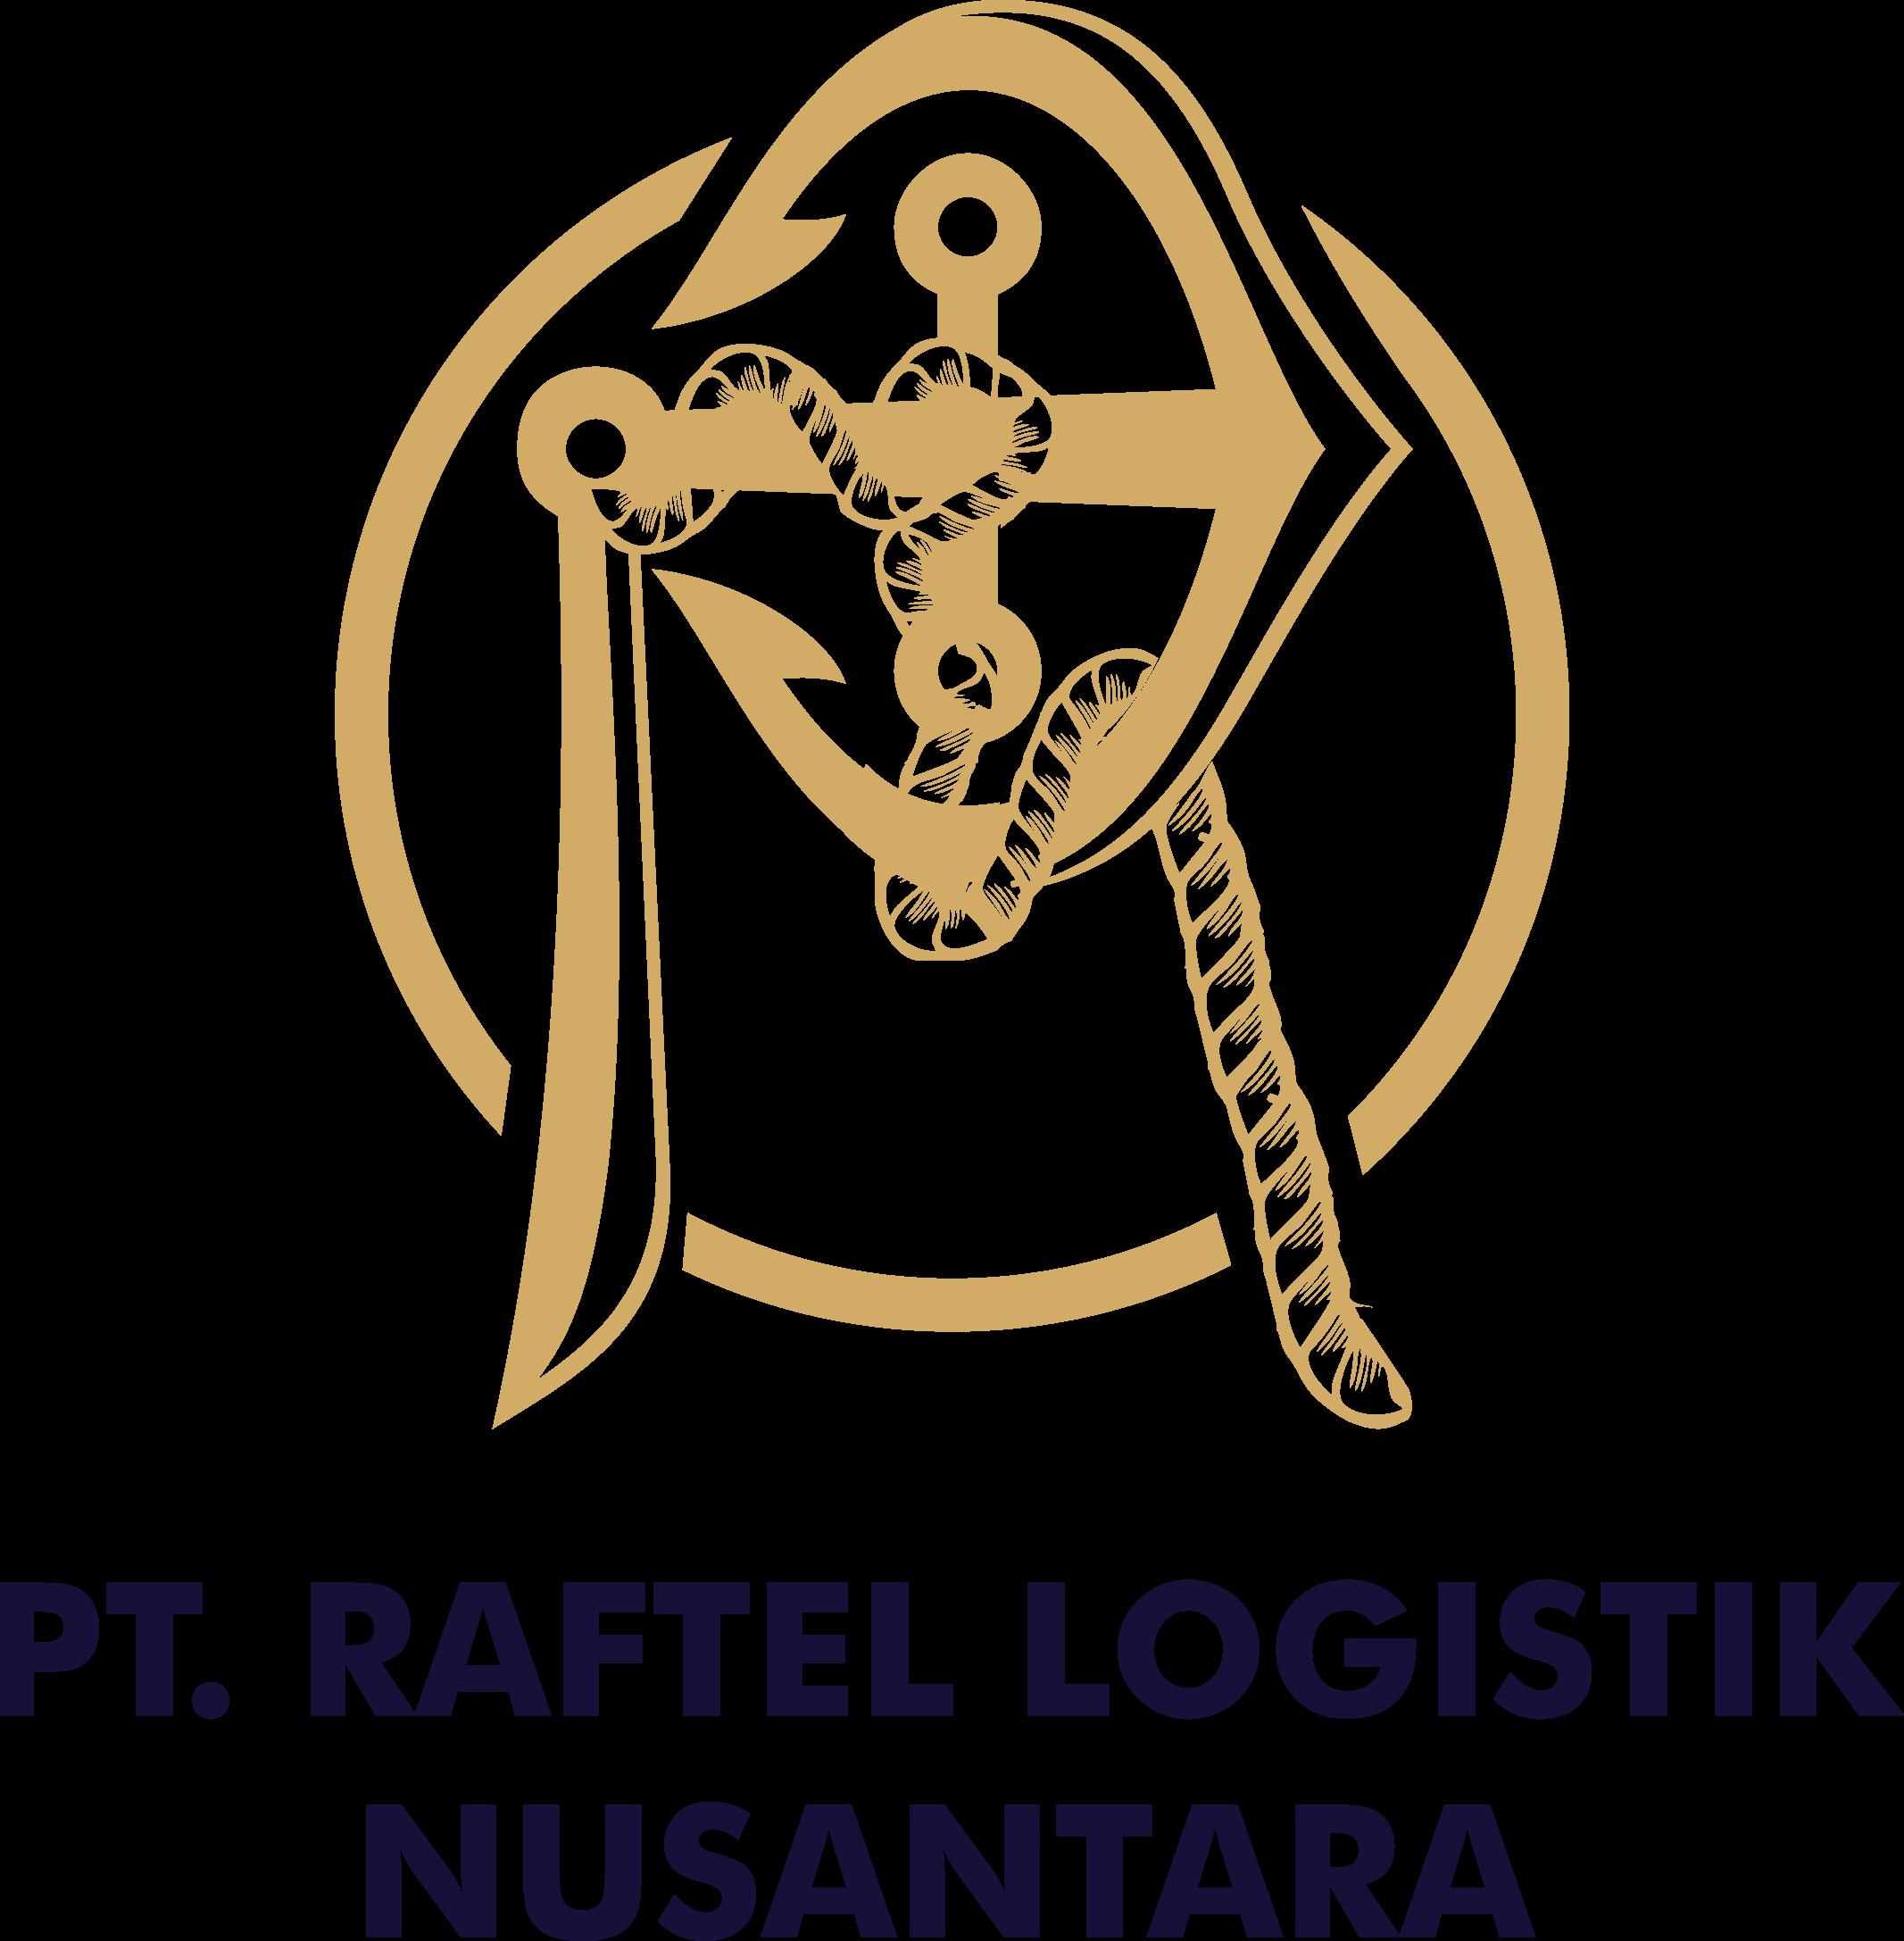 Raftel Logistik